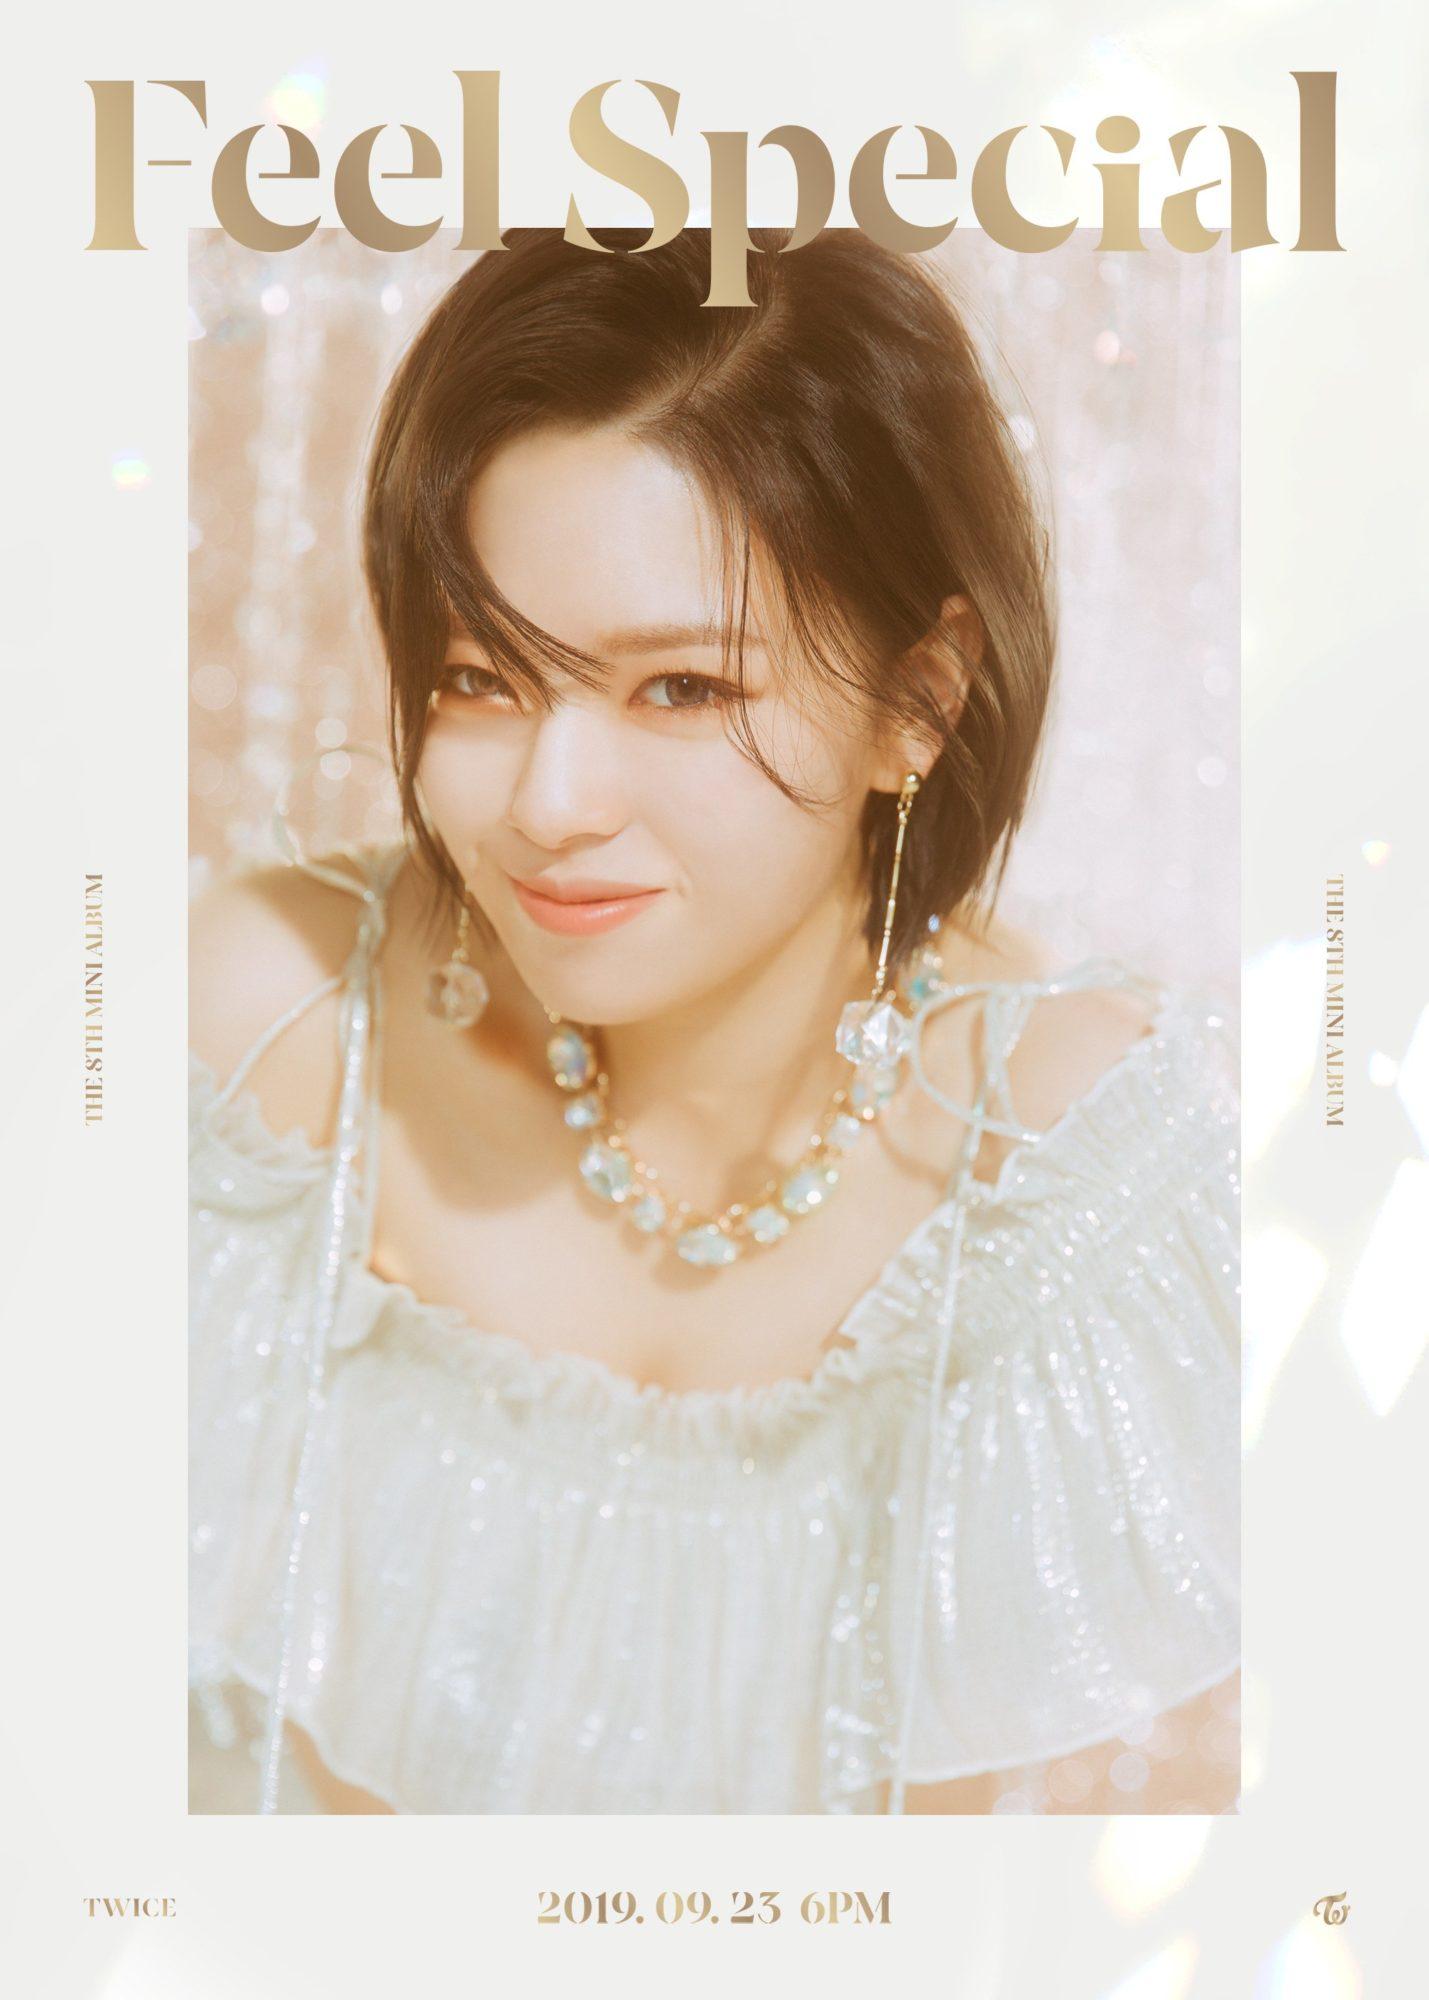 Twice Feel Special Jeongyeon Teaser